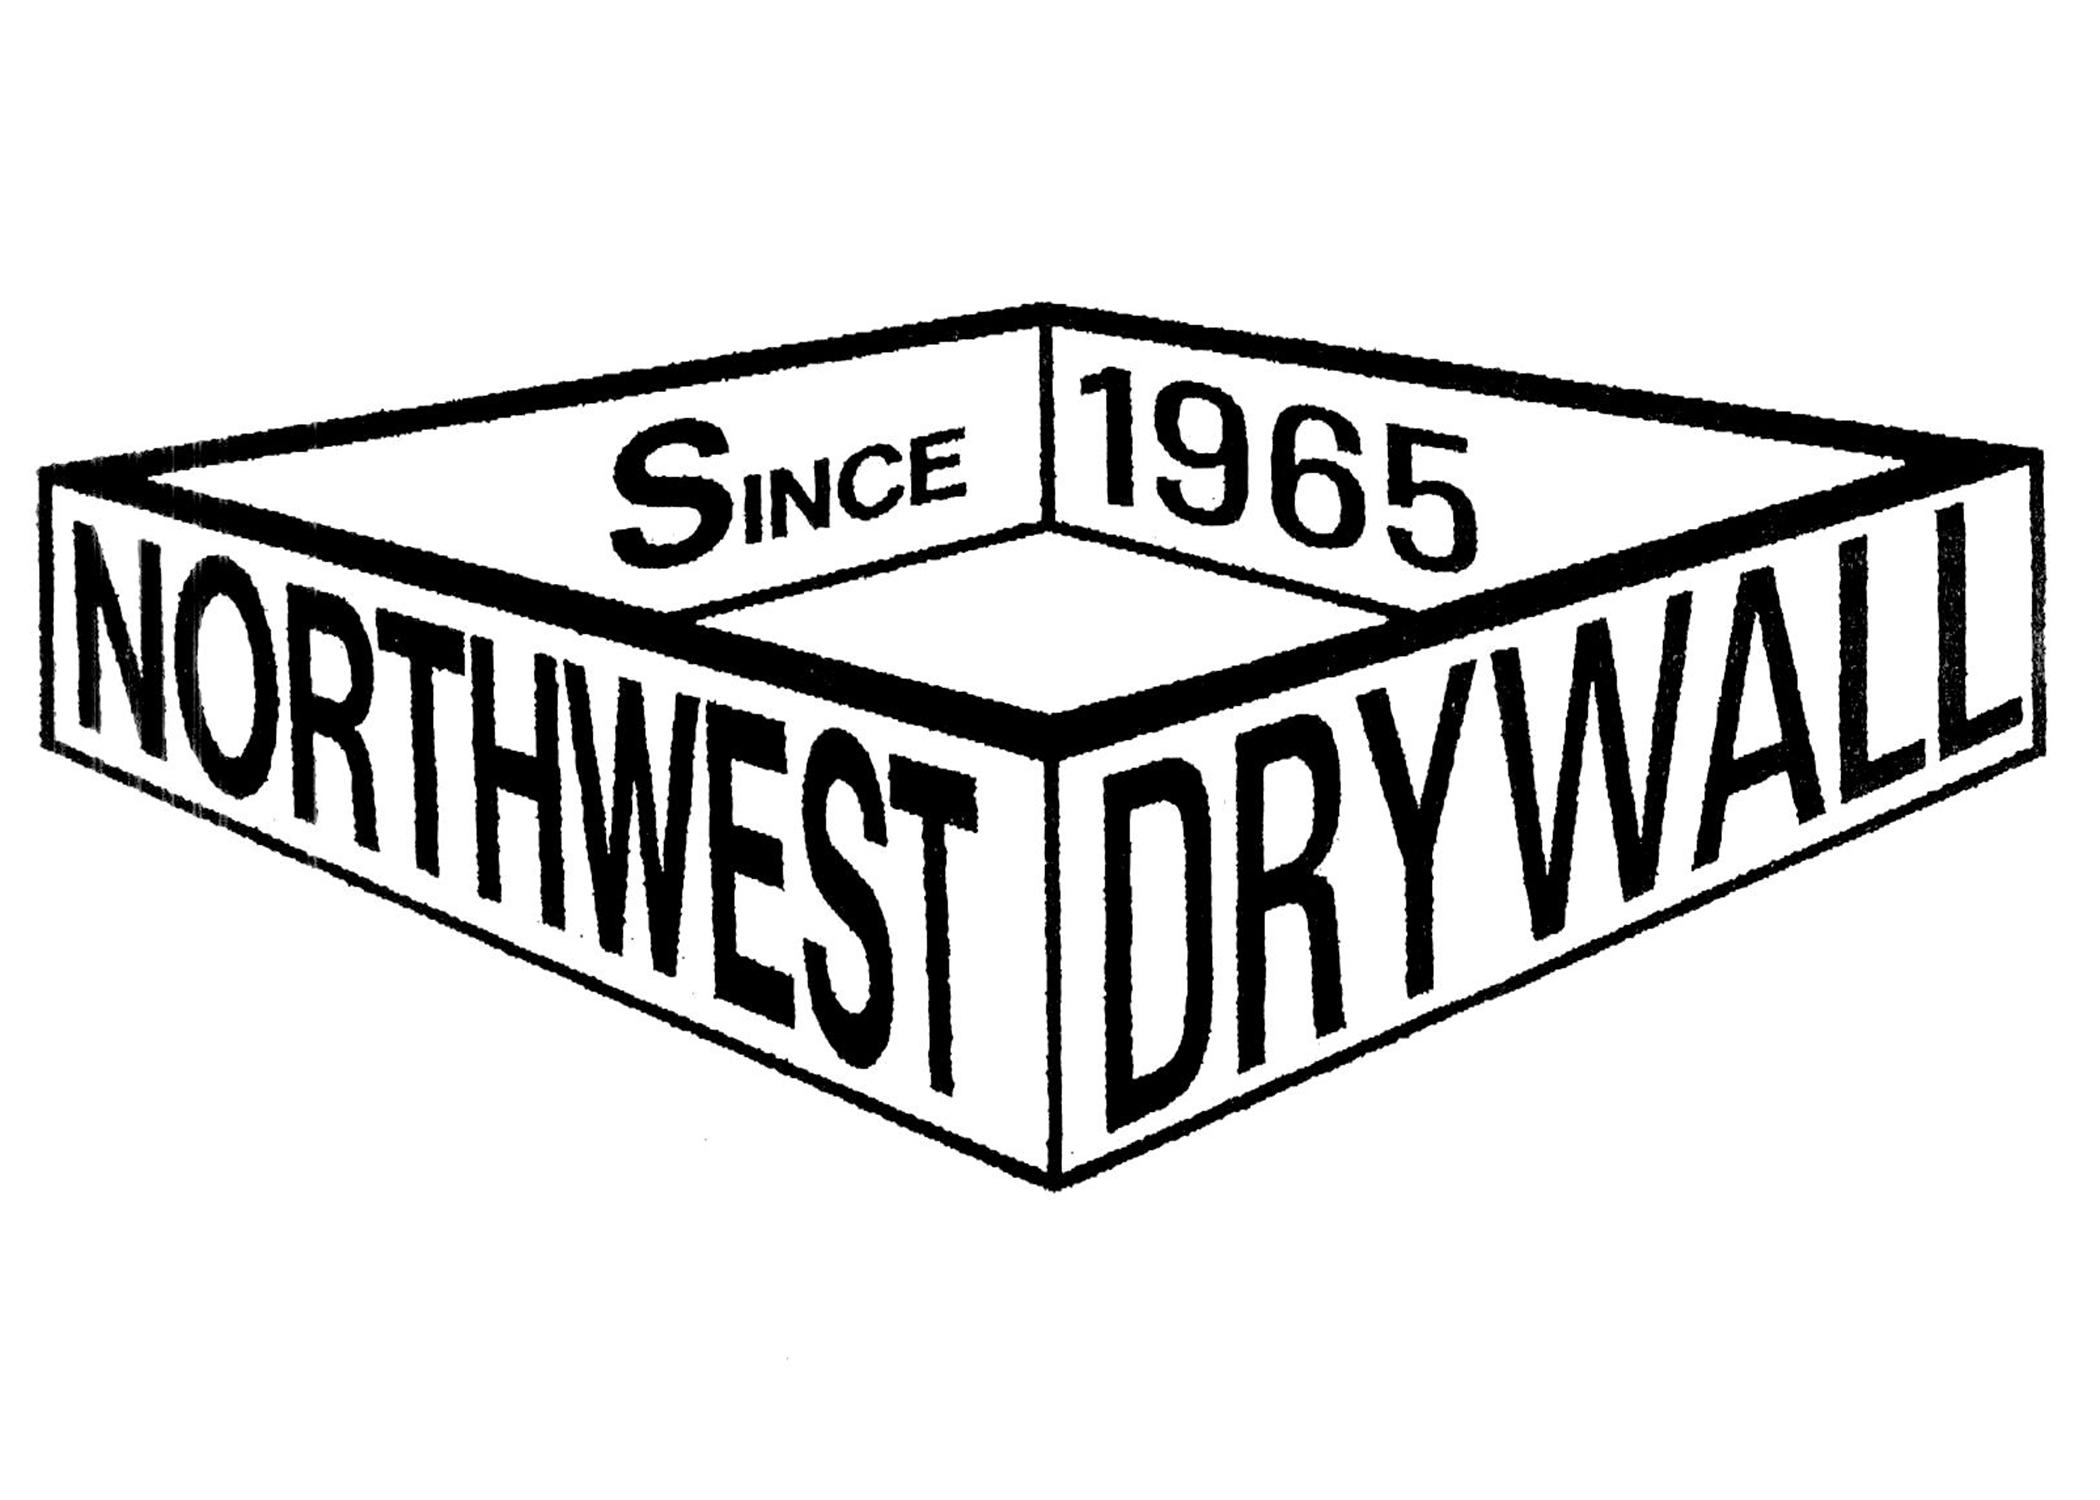 NorthwestDrywallLogo(Correct).jpg